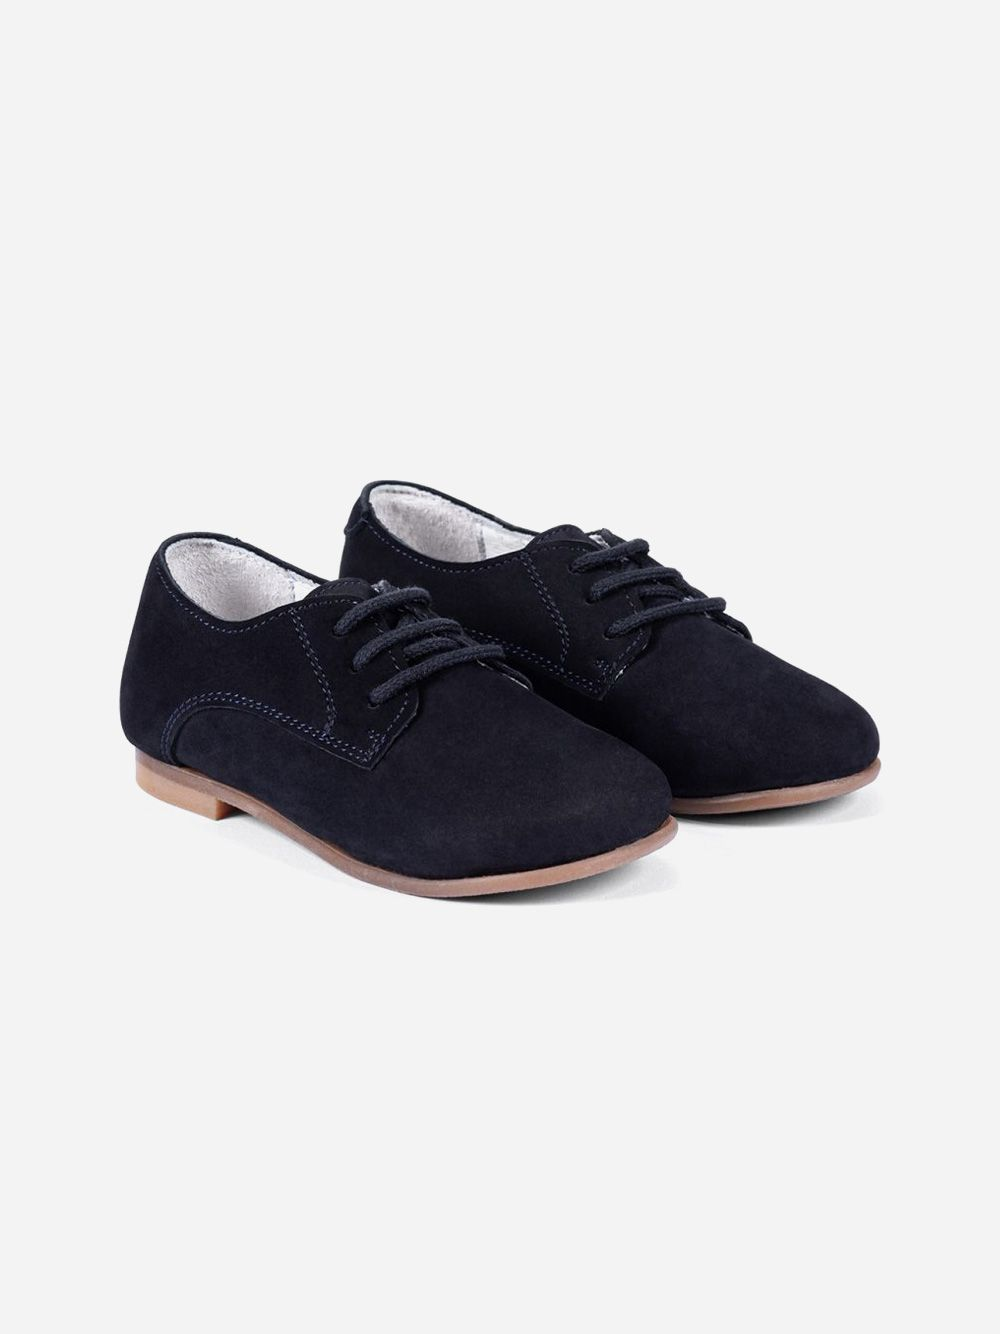 Sapato Oxford Atacadores Marinho | Pikitri